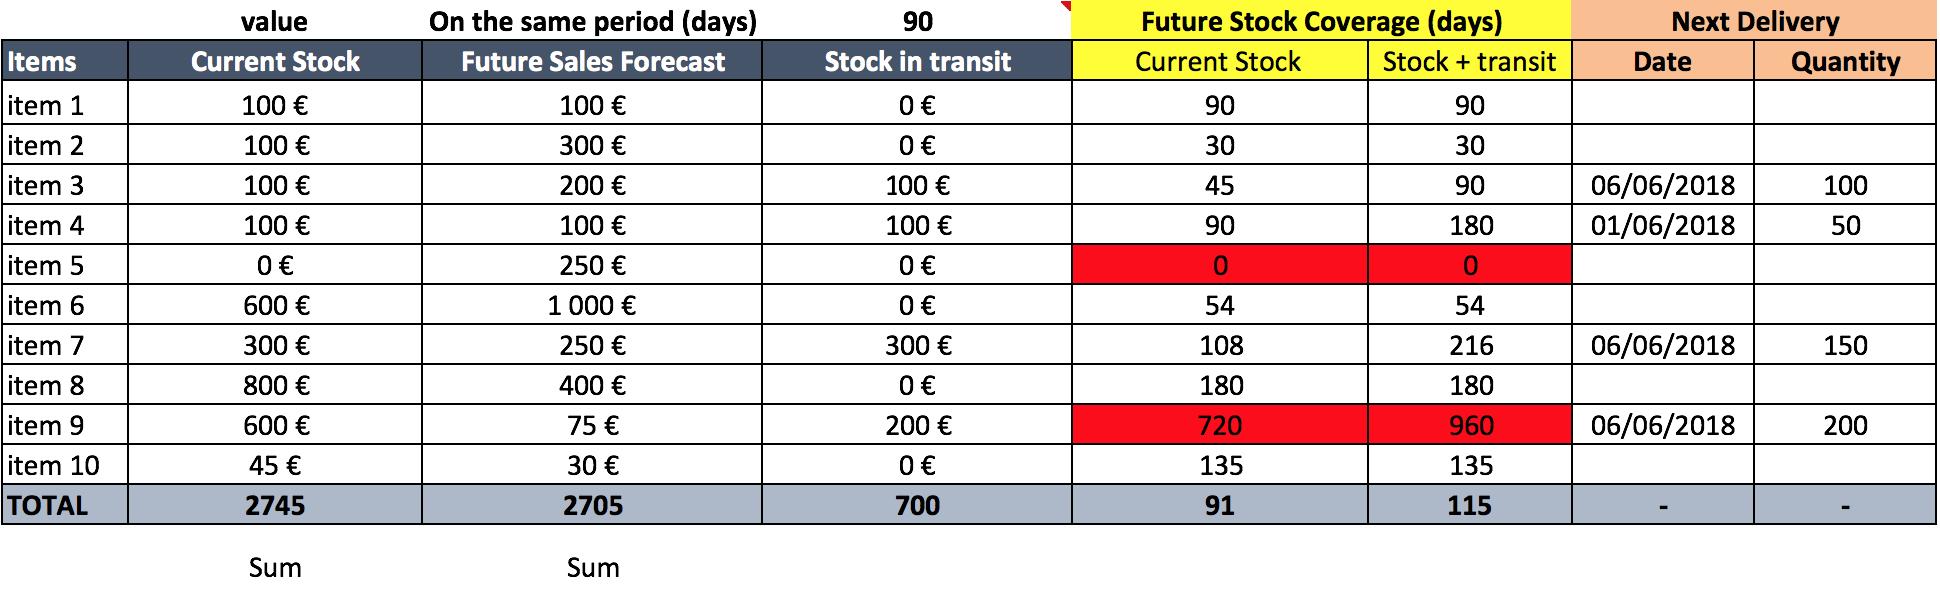 Future_stock_coverage_abcsupplychain